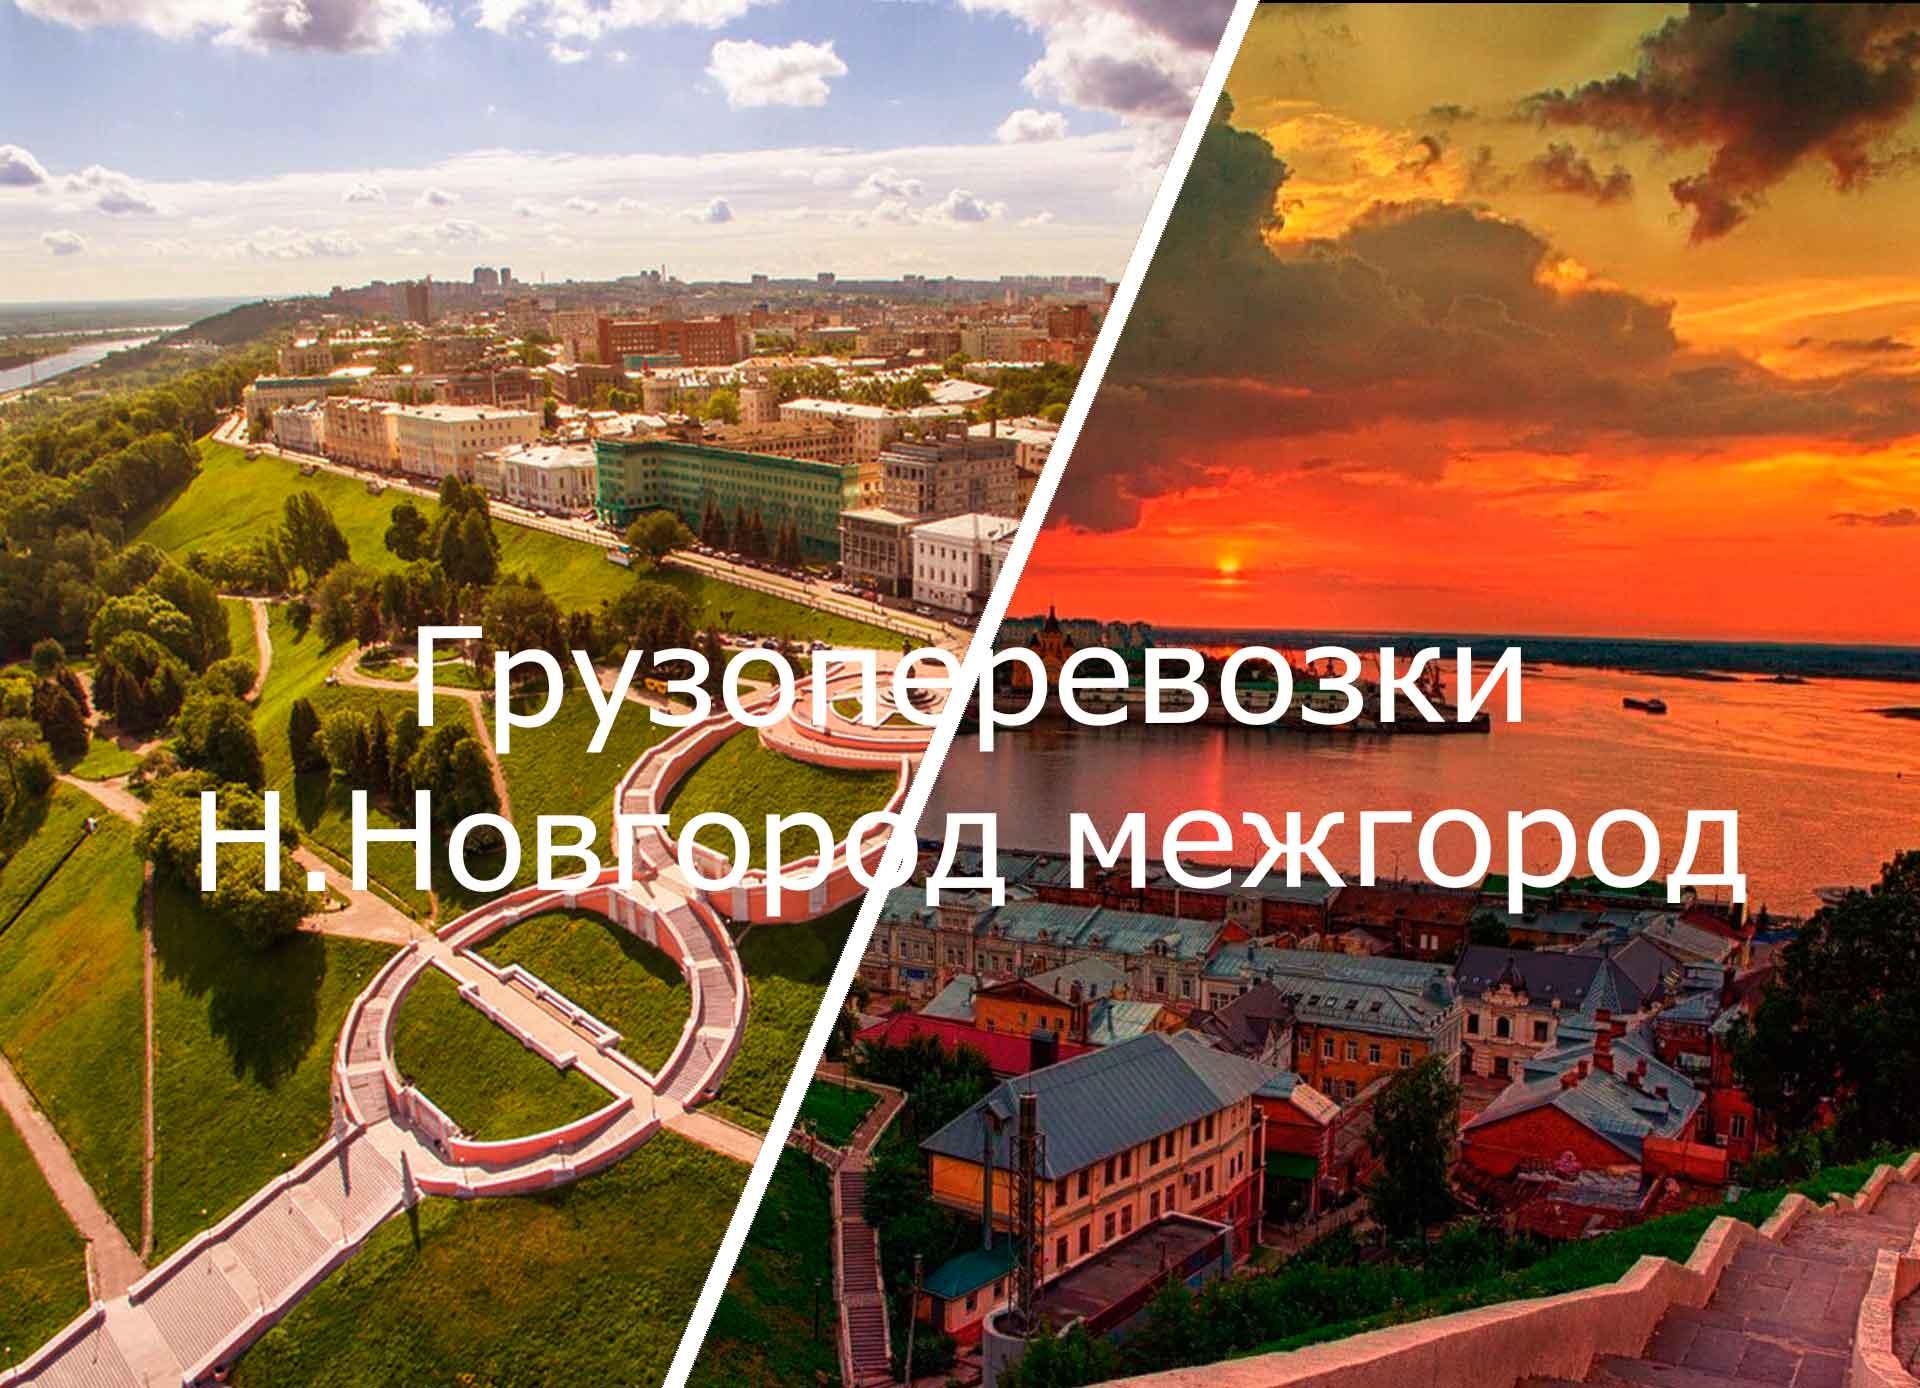 грузоперевозки нижний новгород межгород